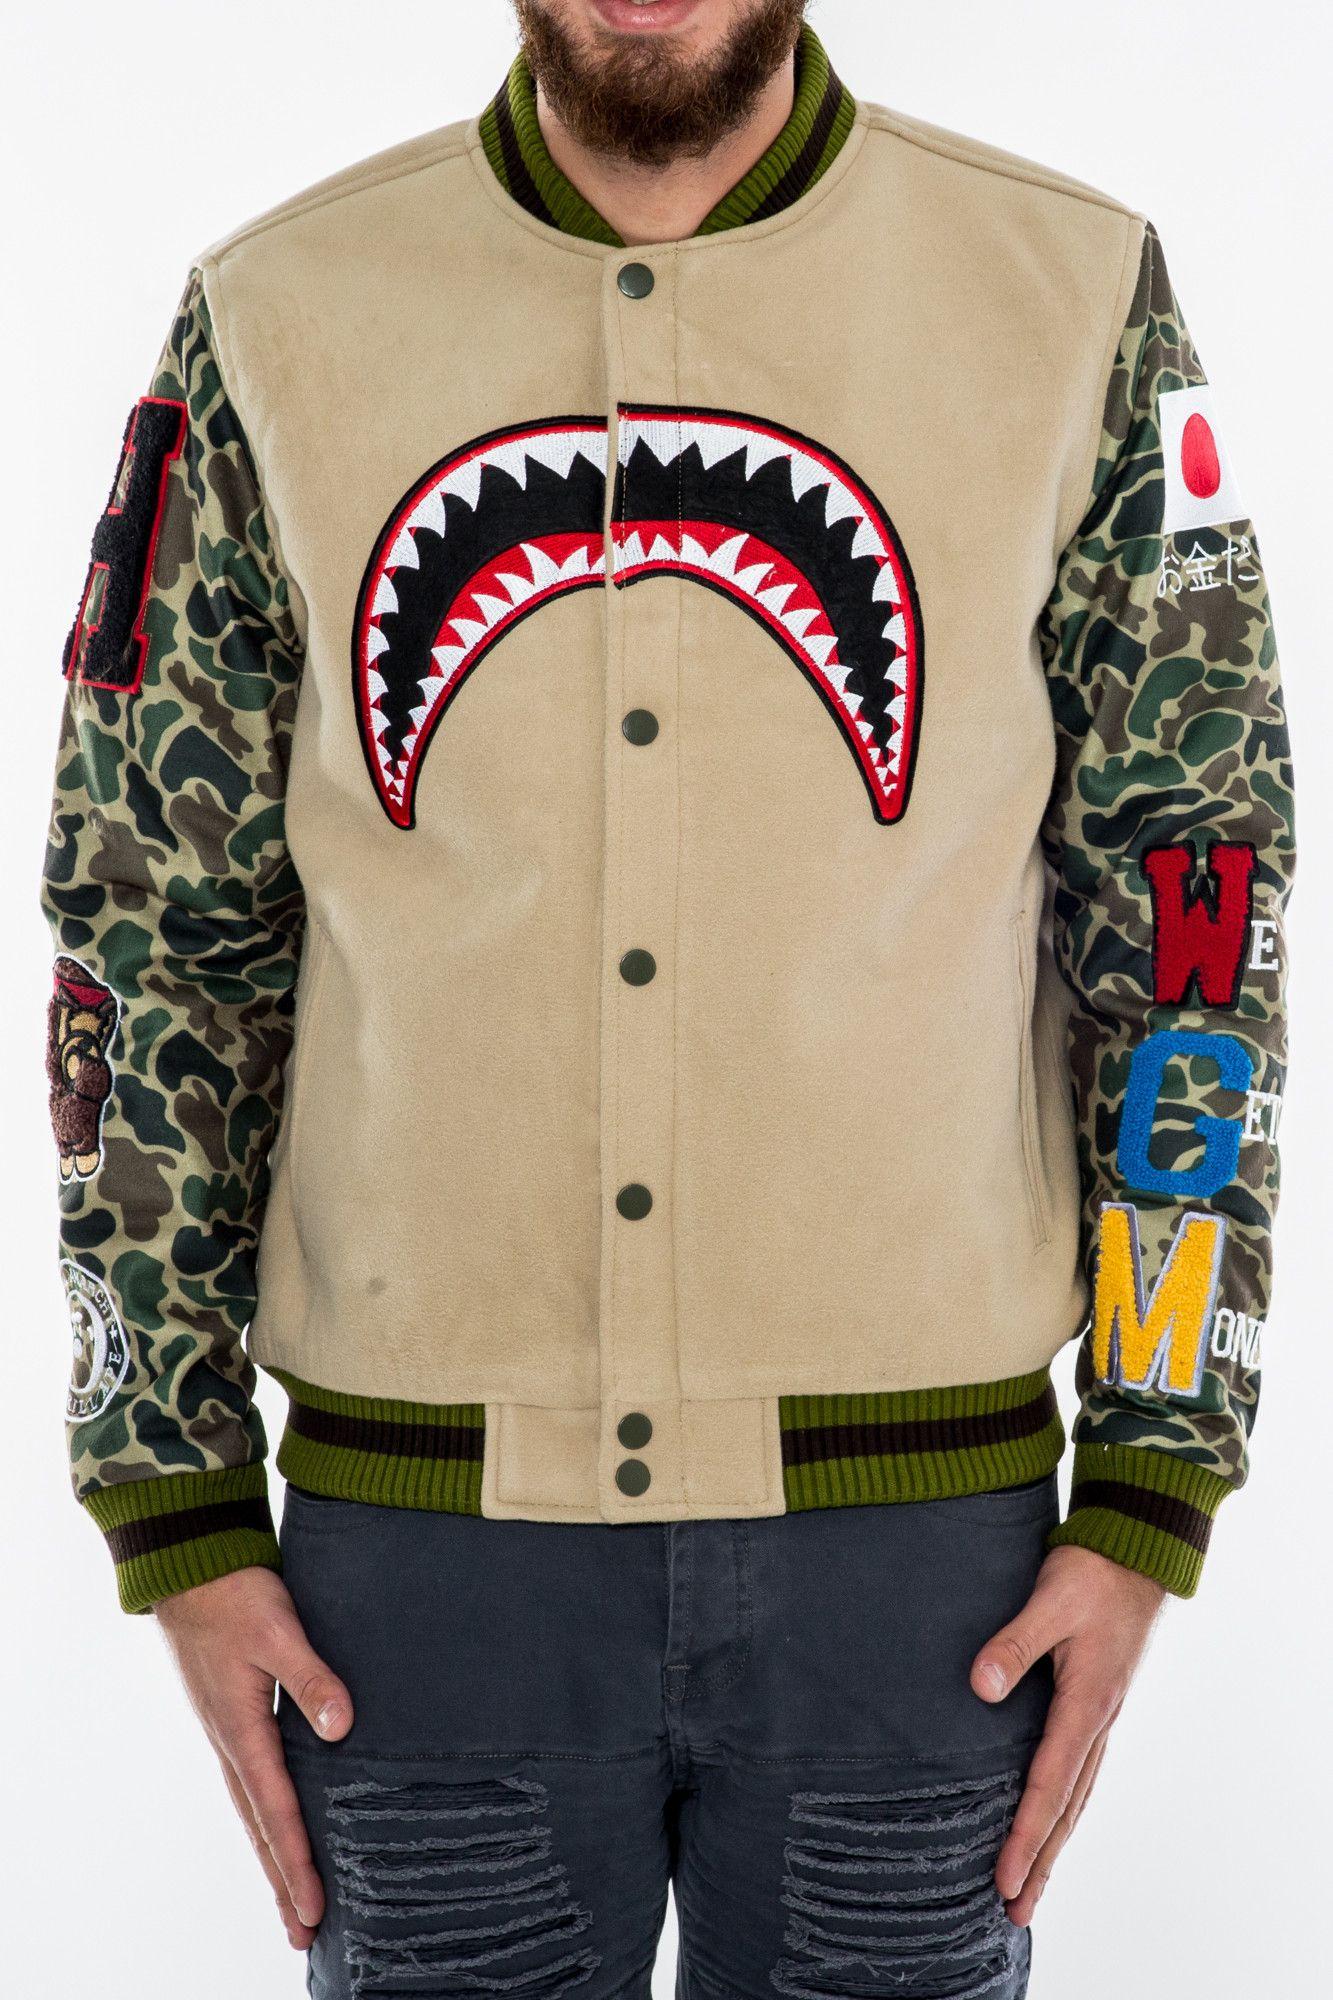 We Killed Ape Varsity Jacket Tan From Hudson Outerwear Varisty Jacket Jackets Varsity Jacket [ 2000 x 1333 Pixel ]